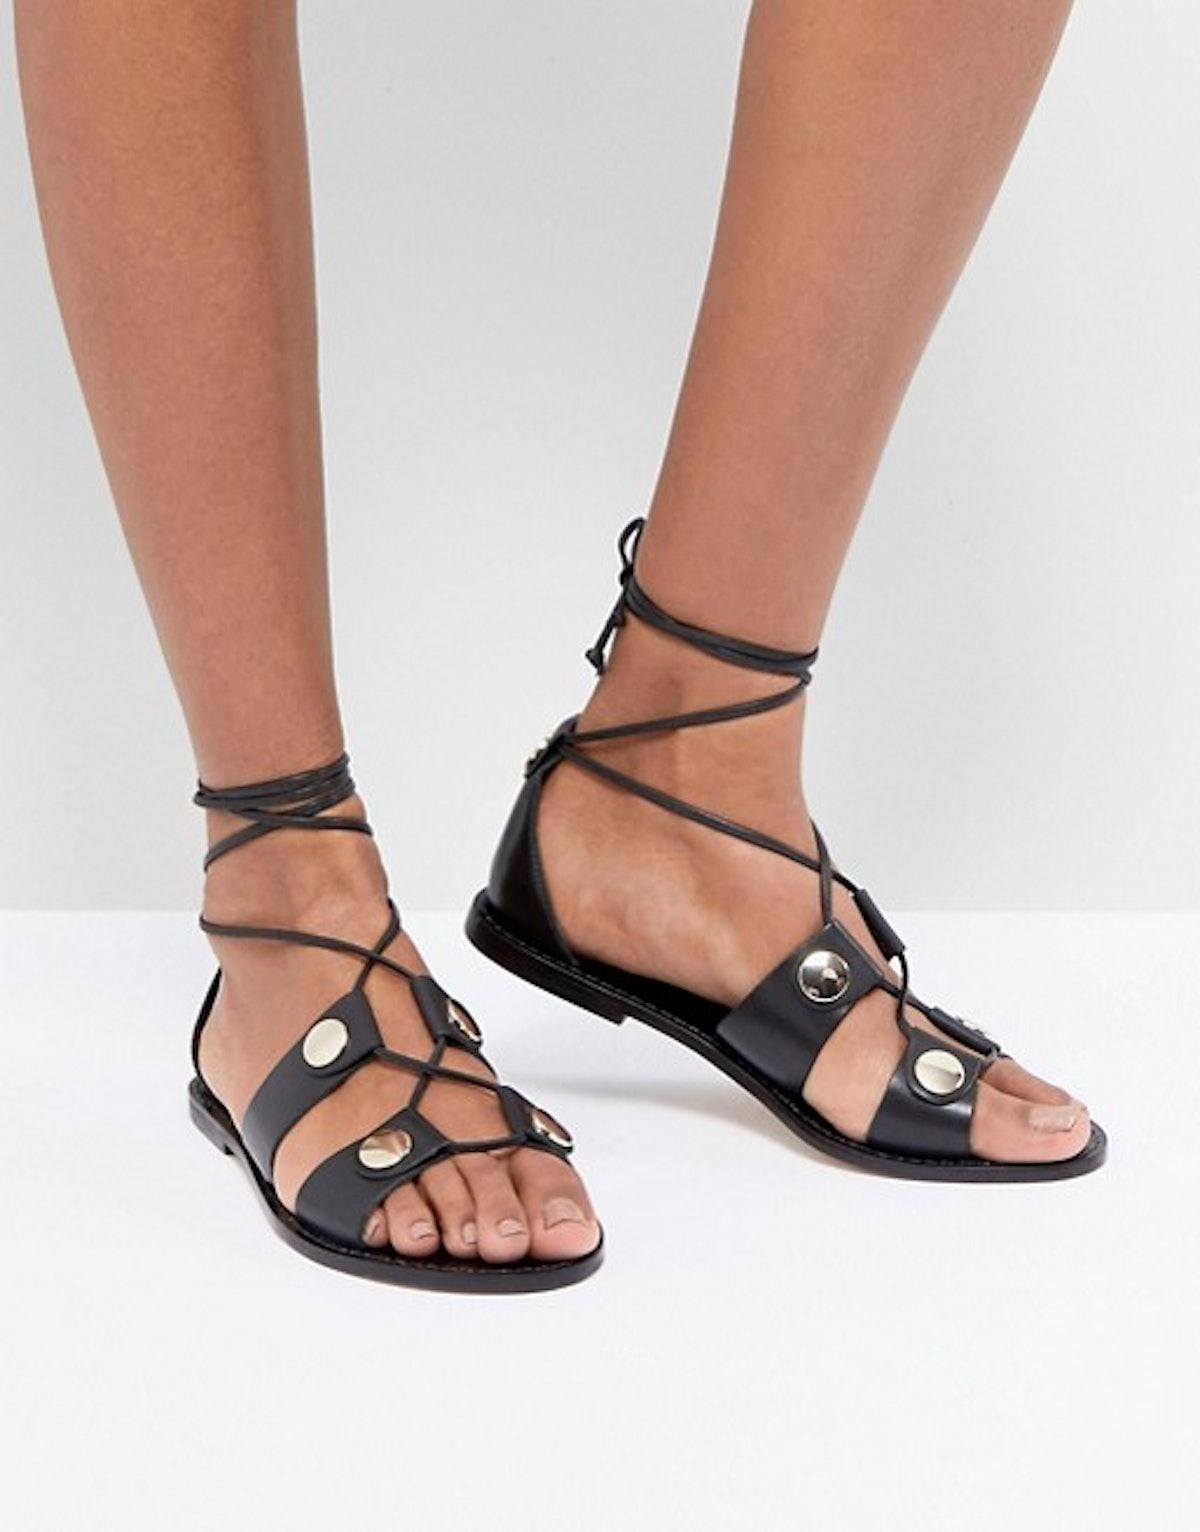 Kurt Geiger Marci leather tie up flat sandals